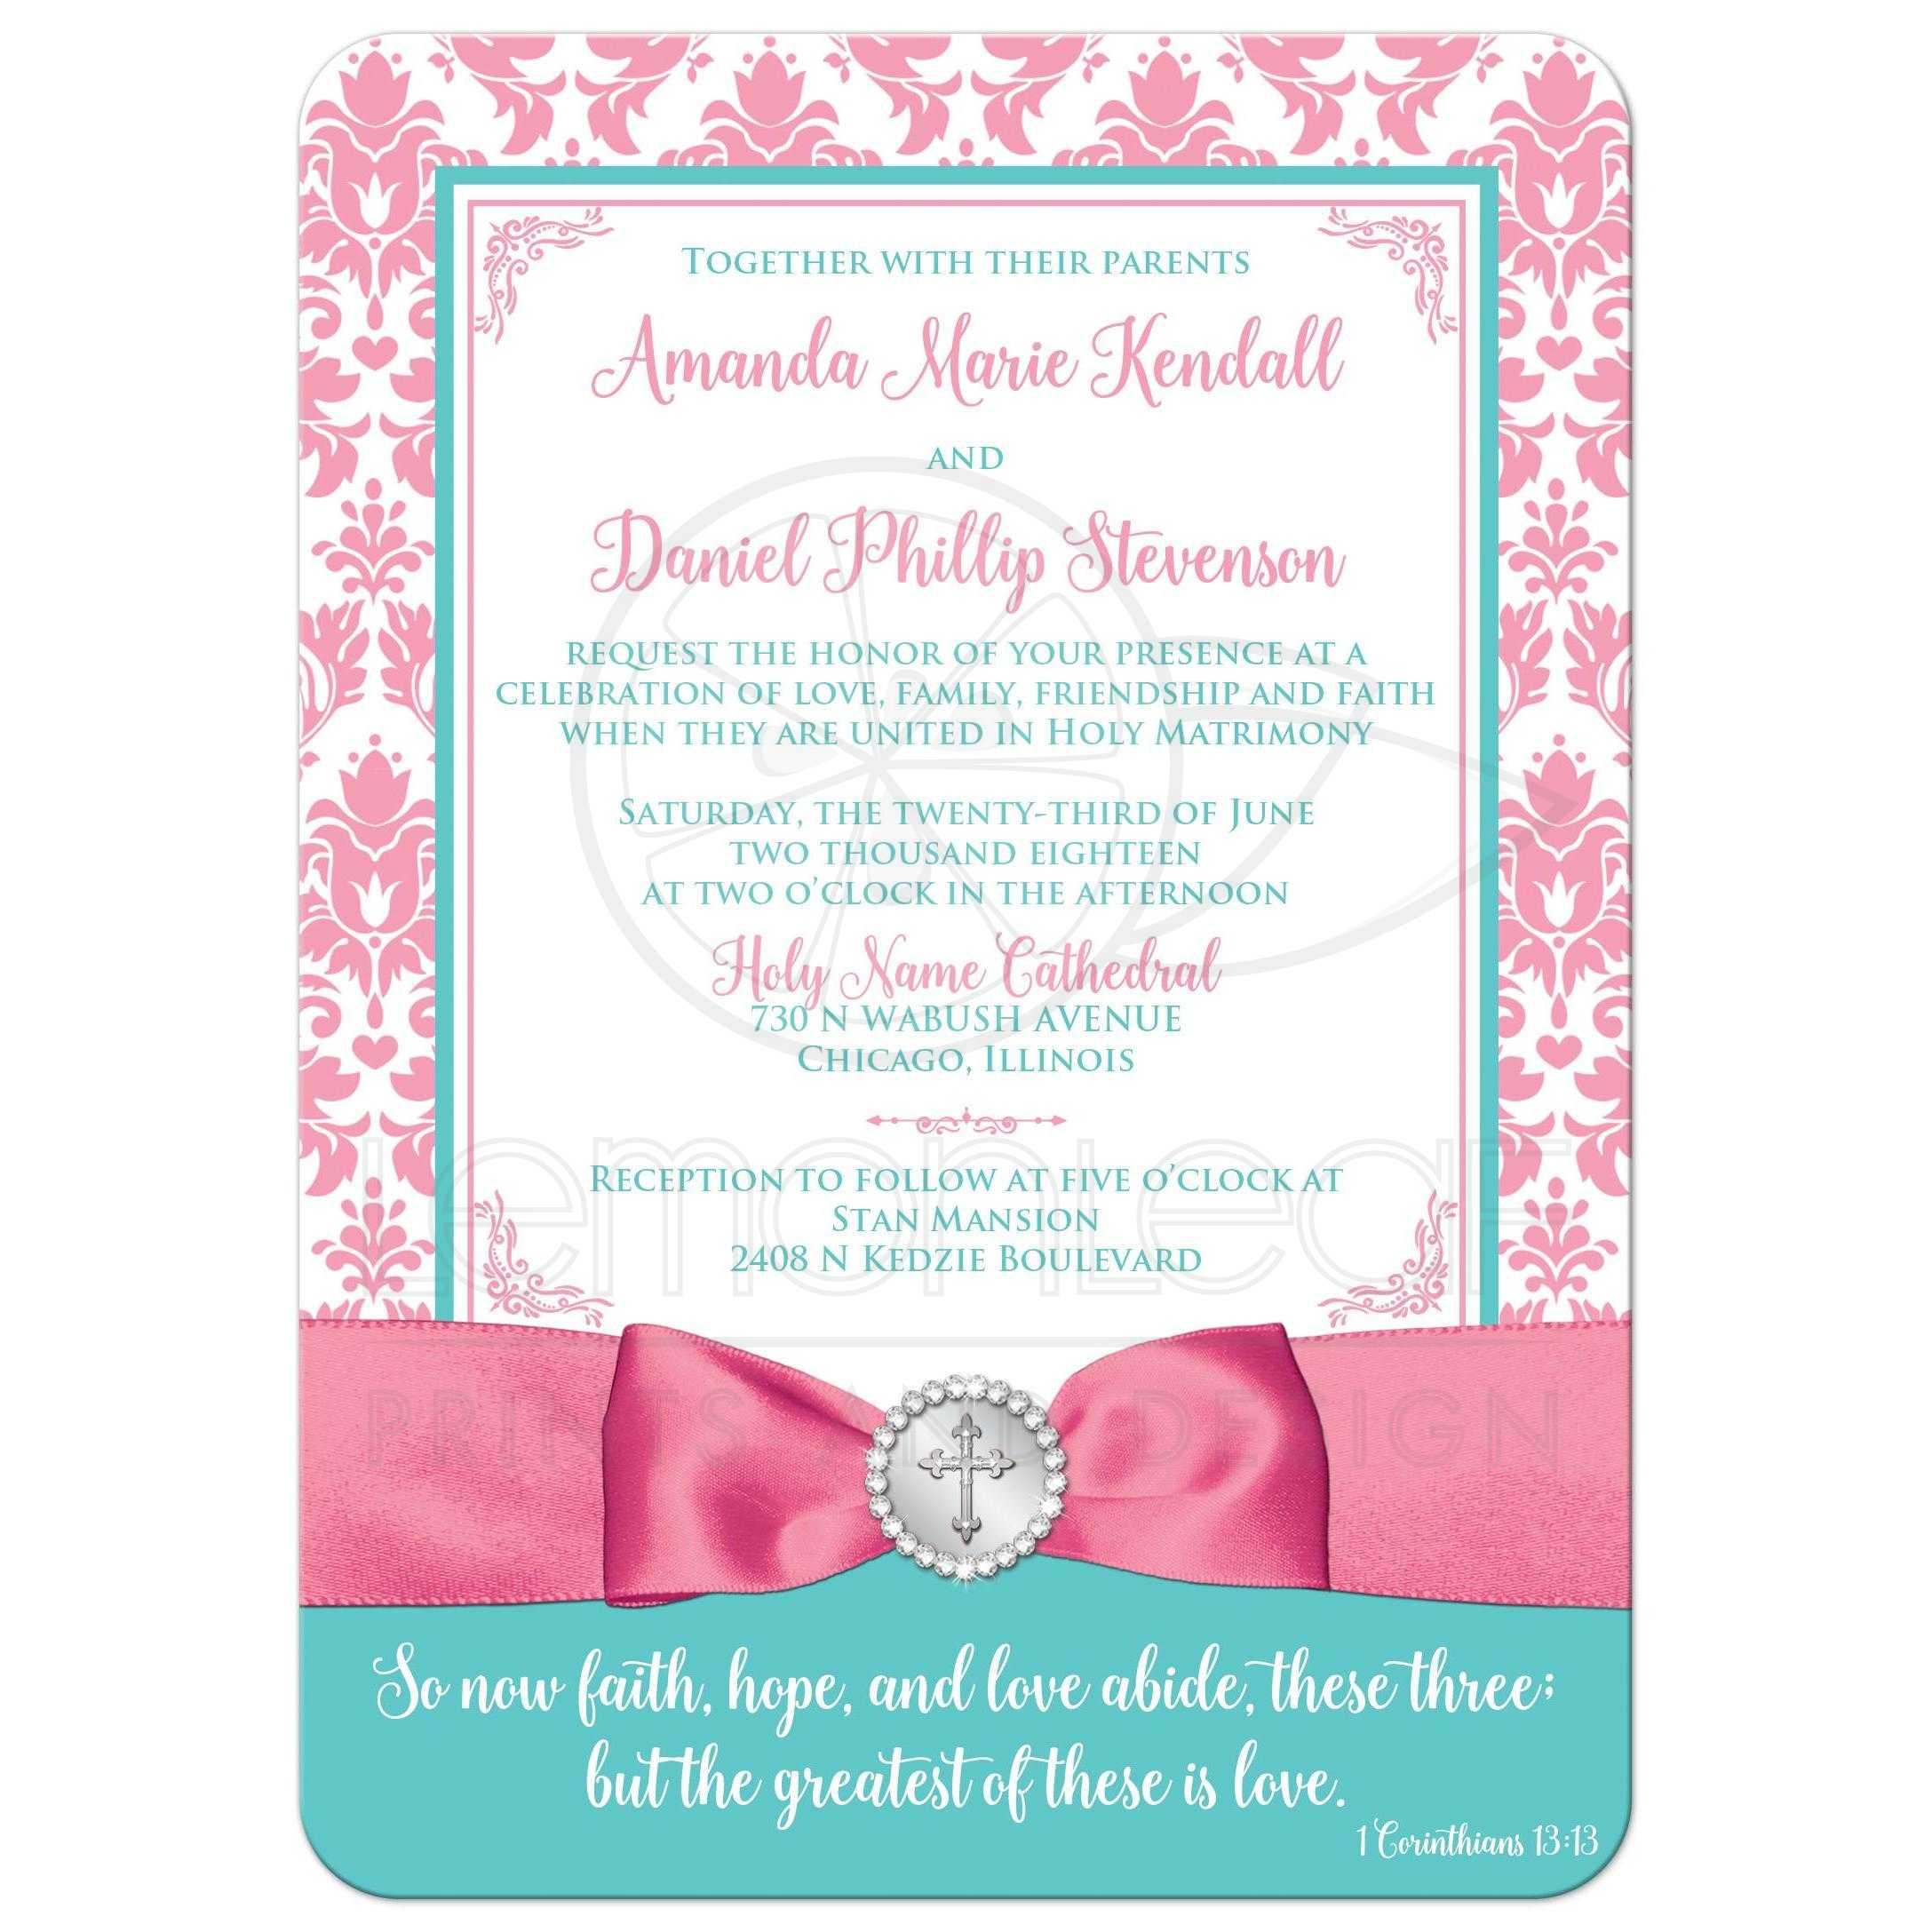 Christian Wedding Reception Ideas: Christian Wedding Invite - OPTIONAL Photo